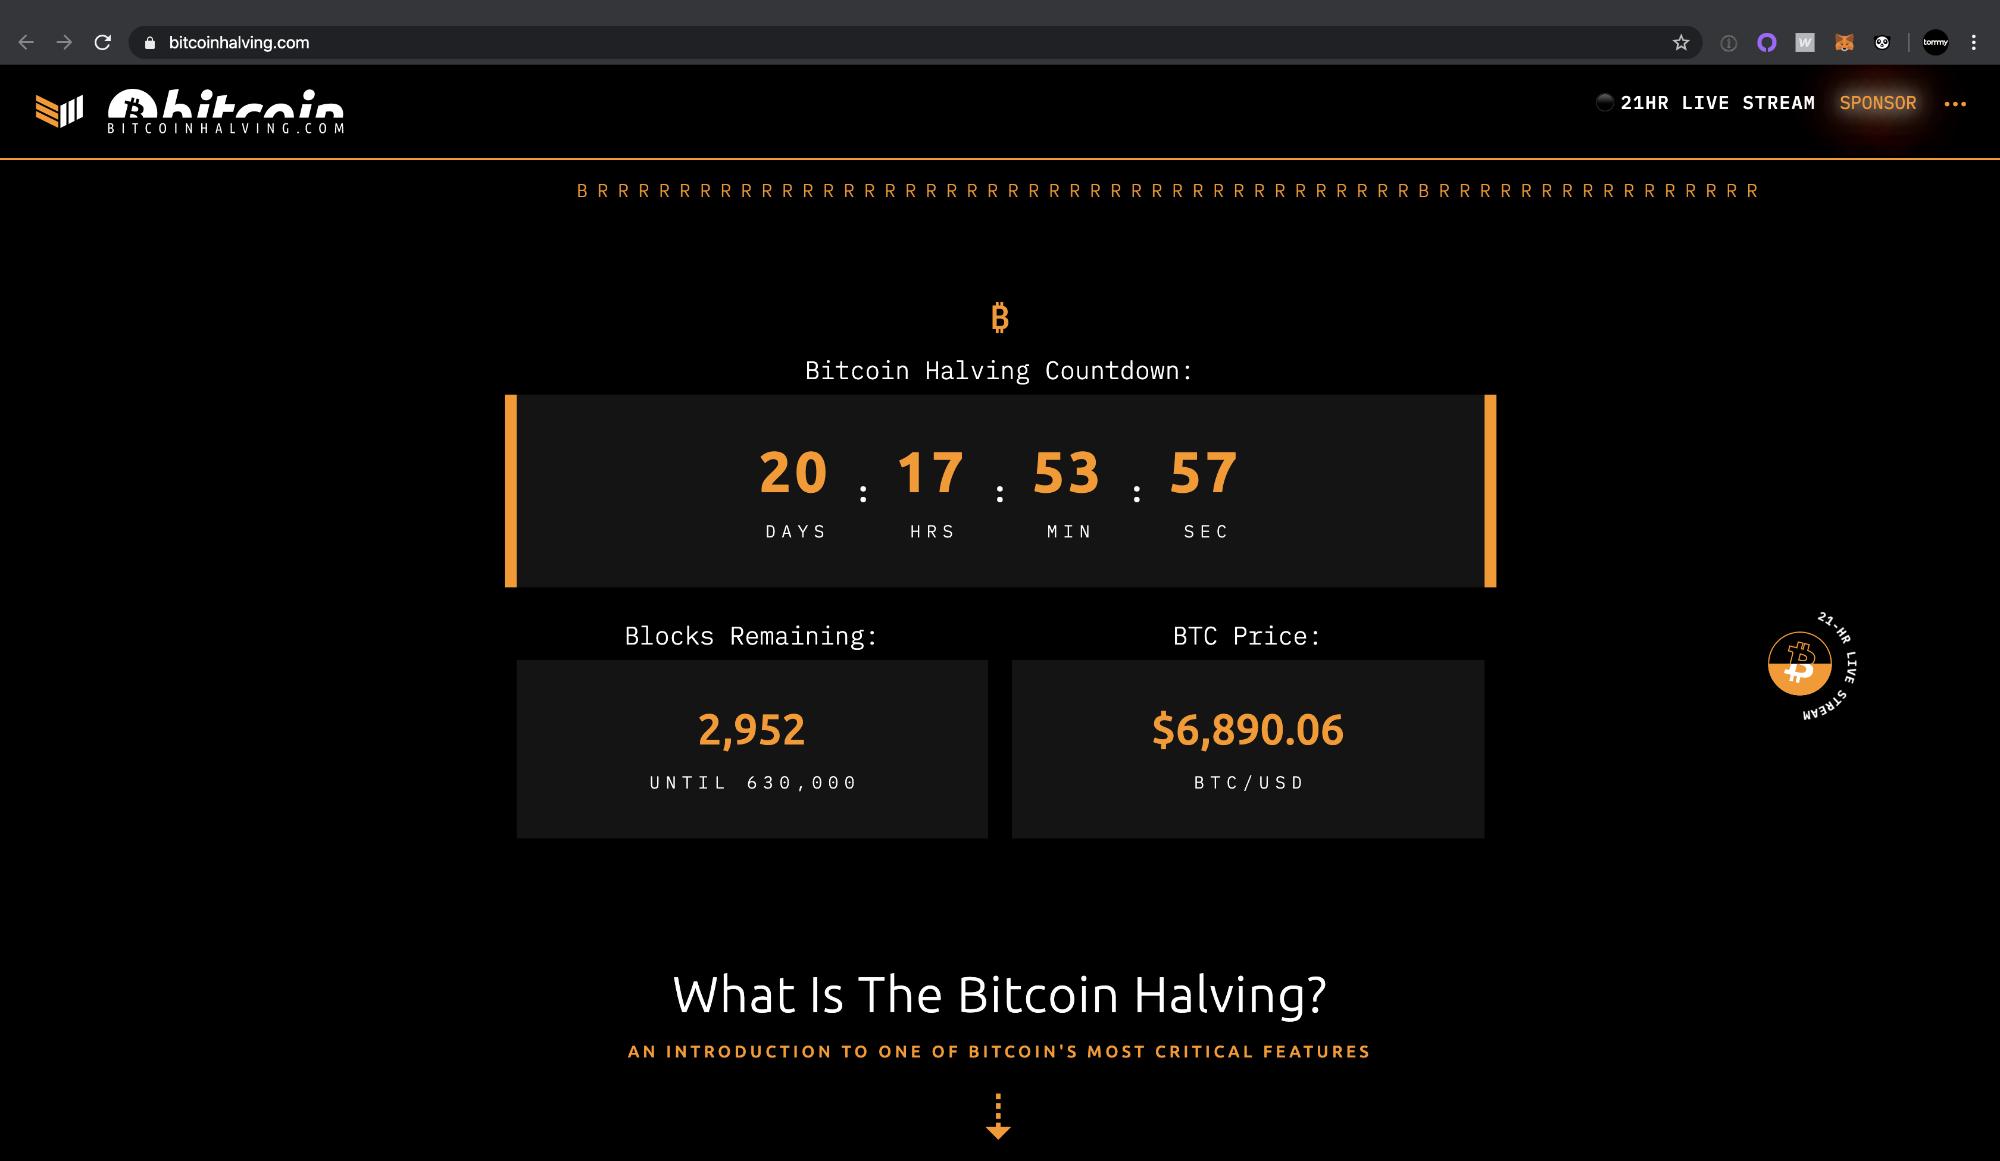 BitcoinHalving.com by Bitcoin Magazine